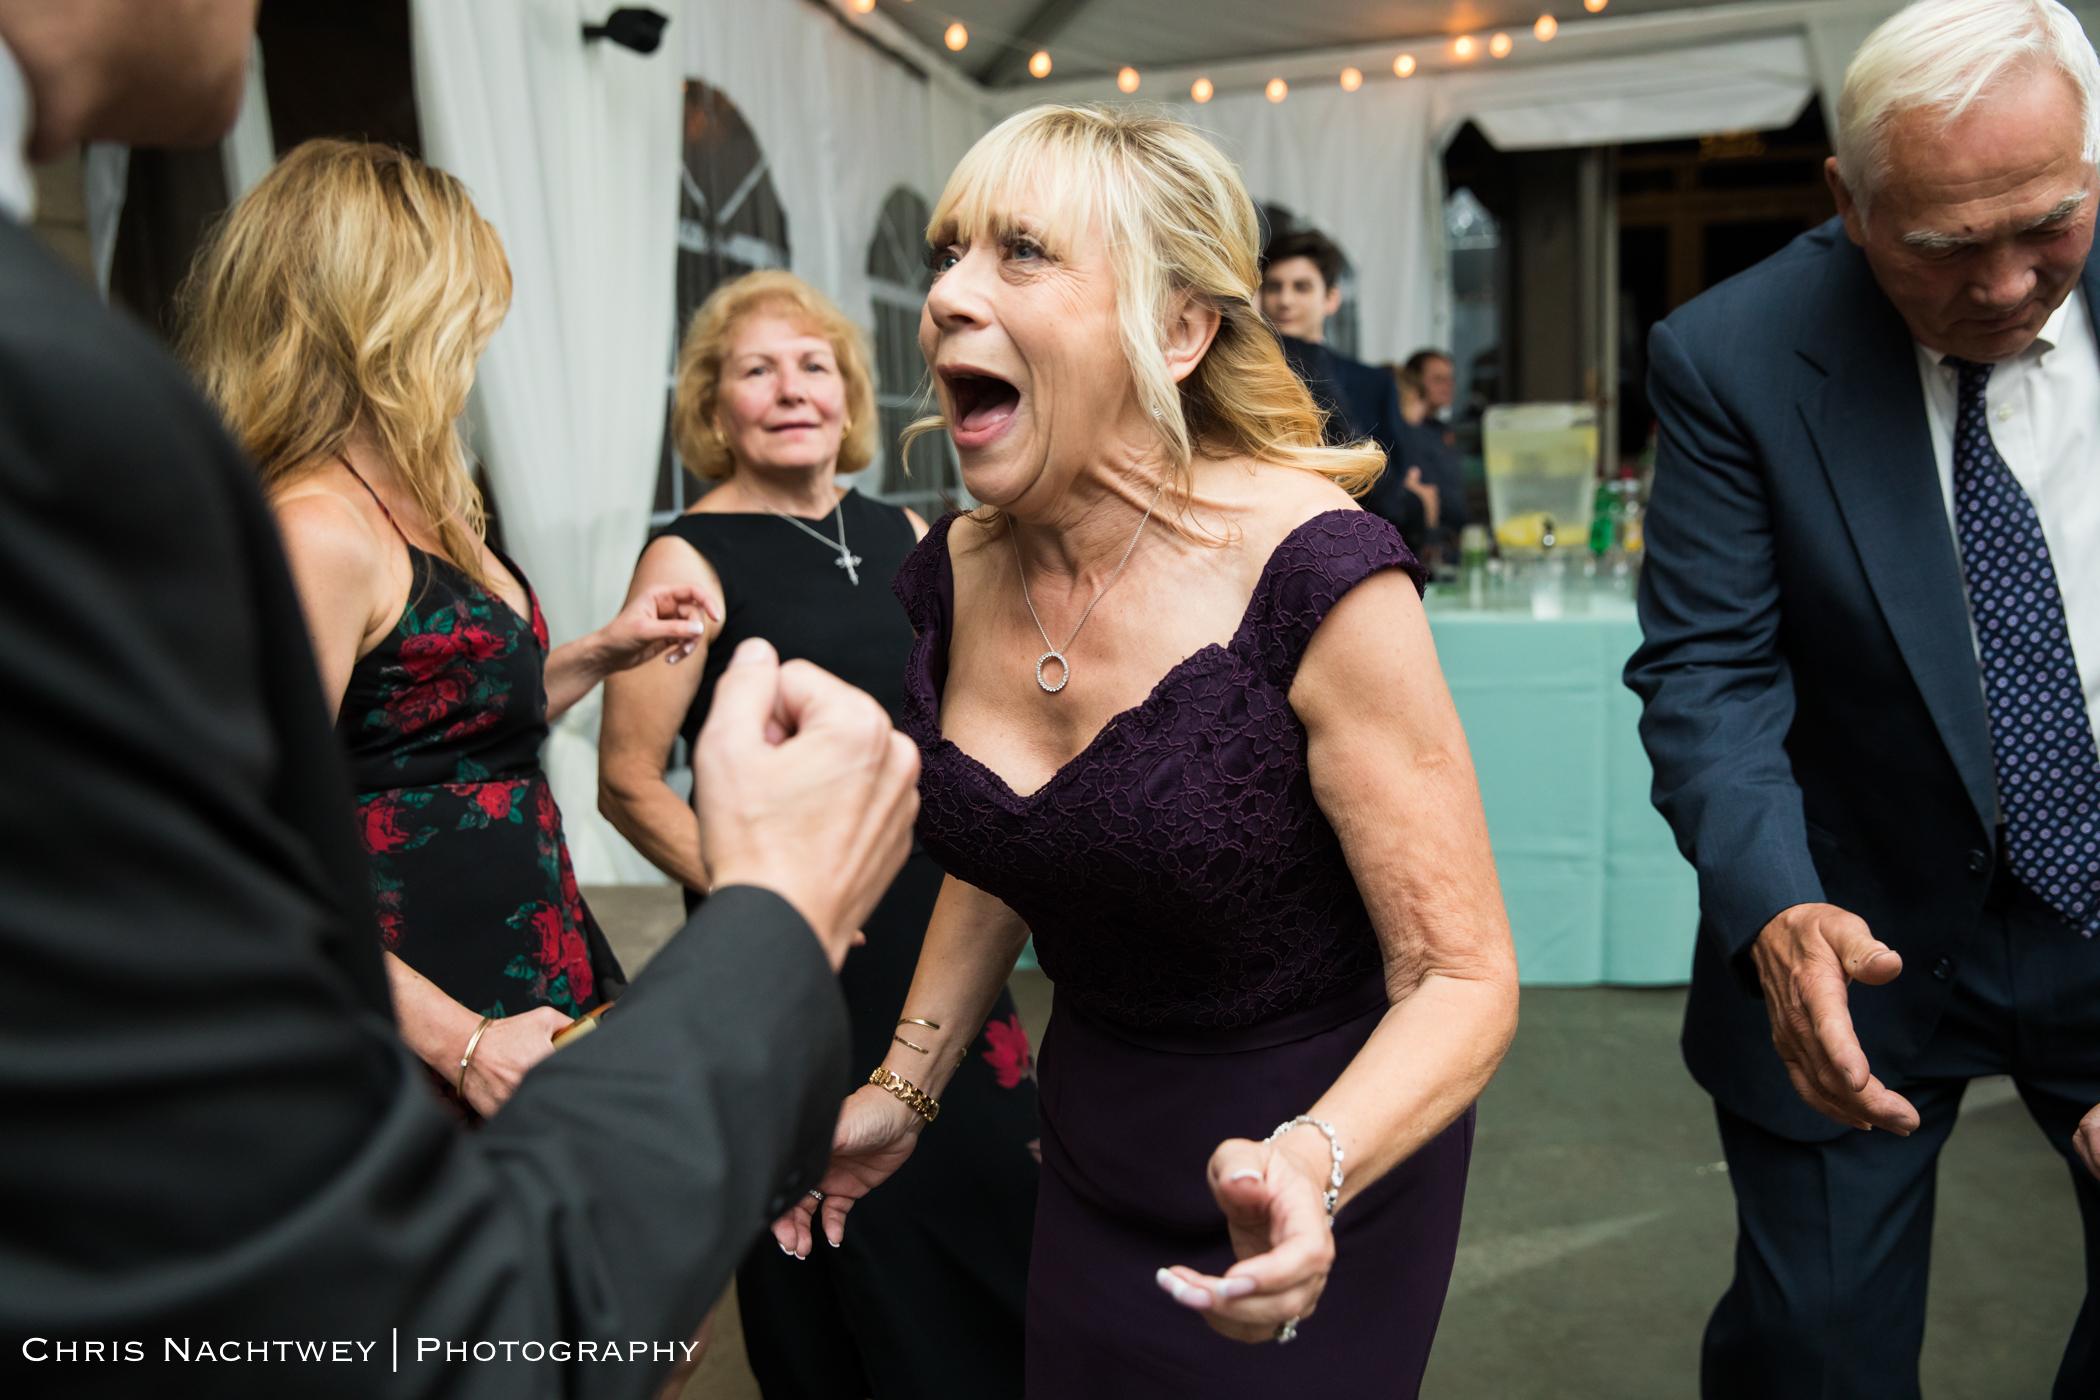 harkness-wedding-photos-chris-nachtwey-photography-2018-43.jpg